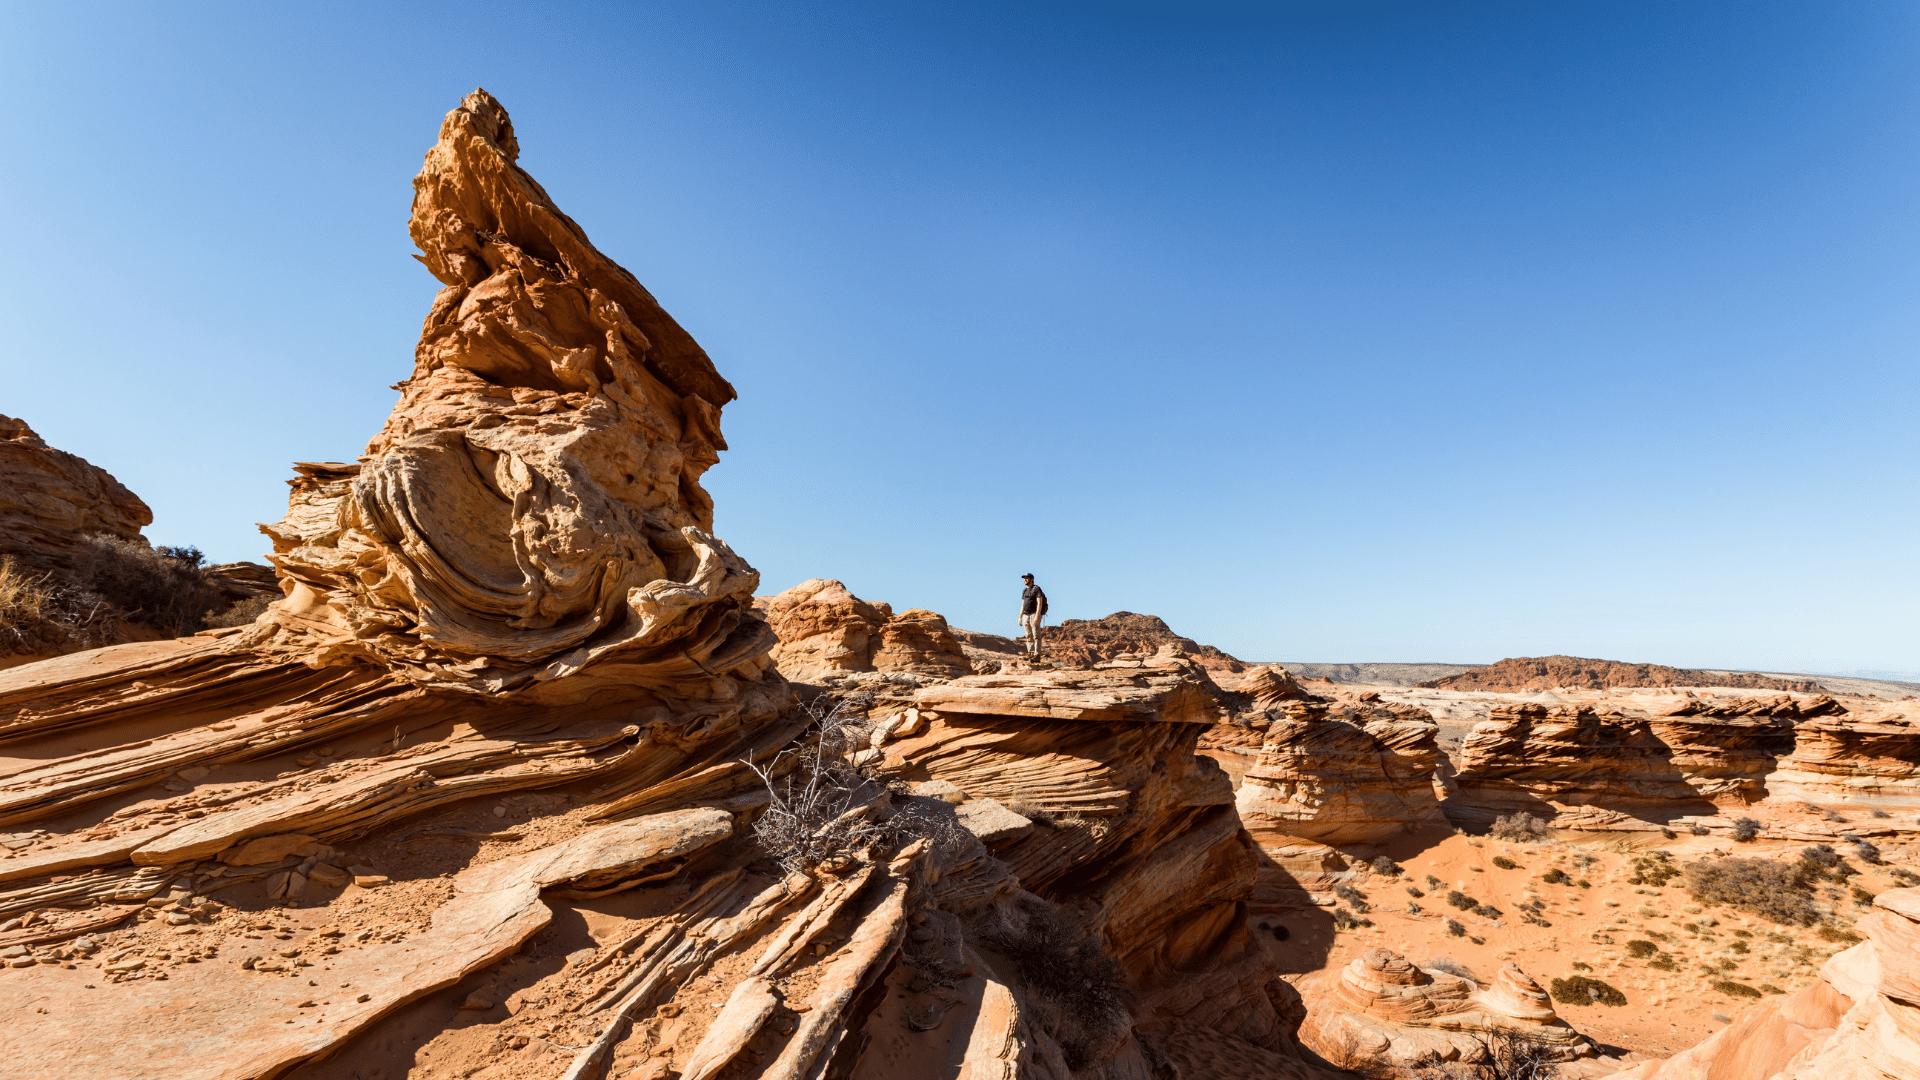 Der ultimative Southern Utah Roadtrip: 6 Nationalparks, 2 Wochen